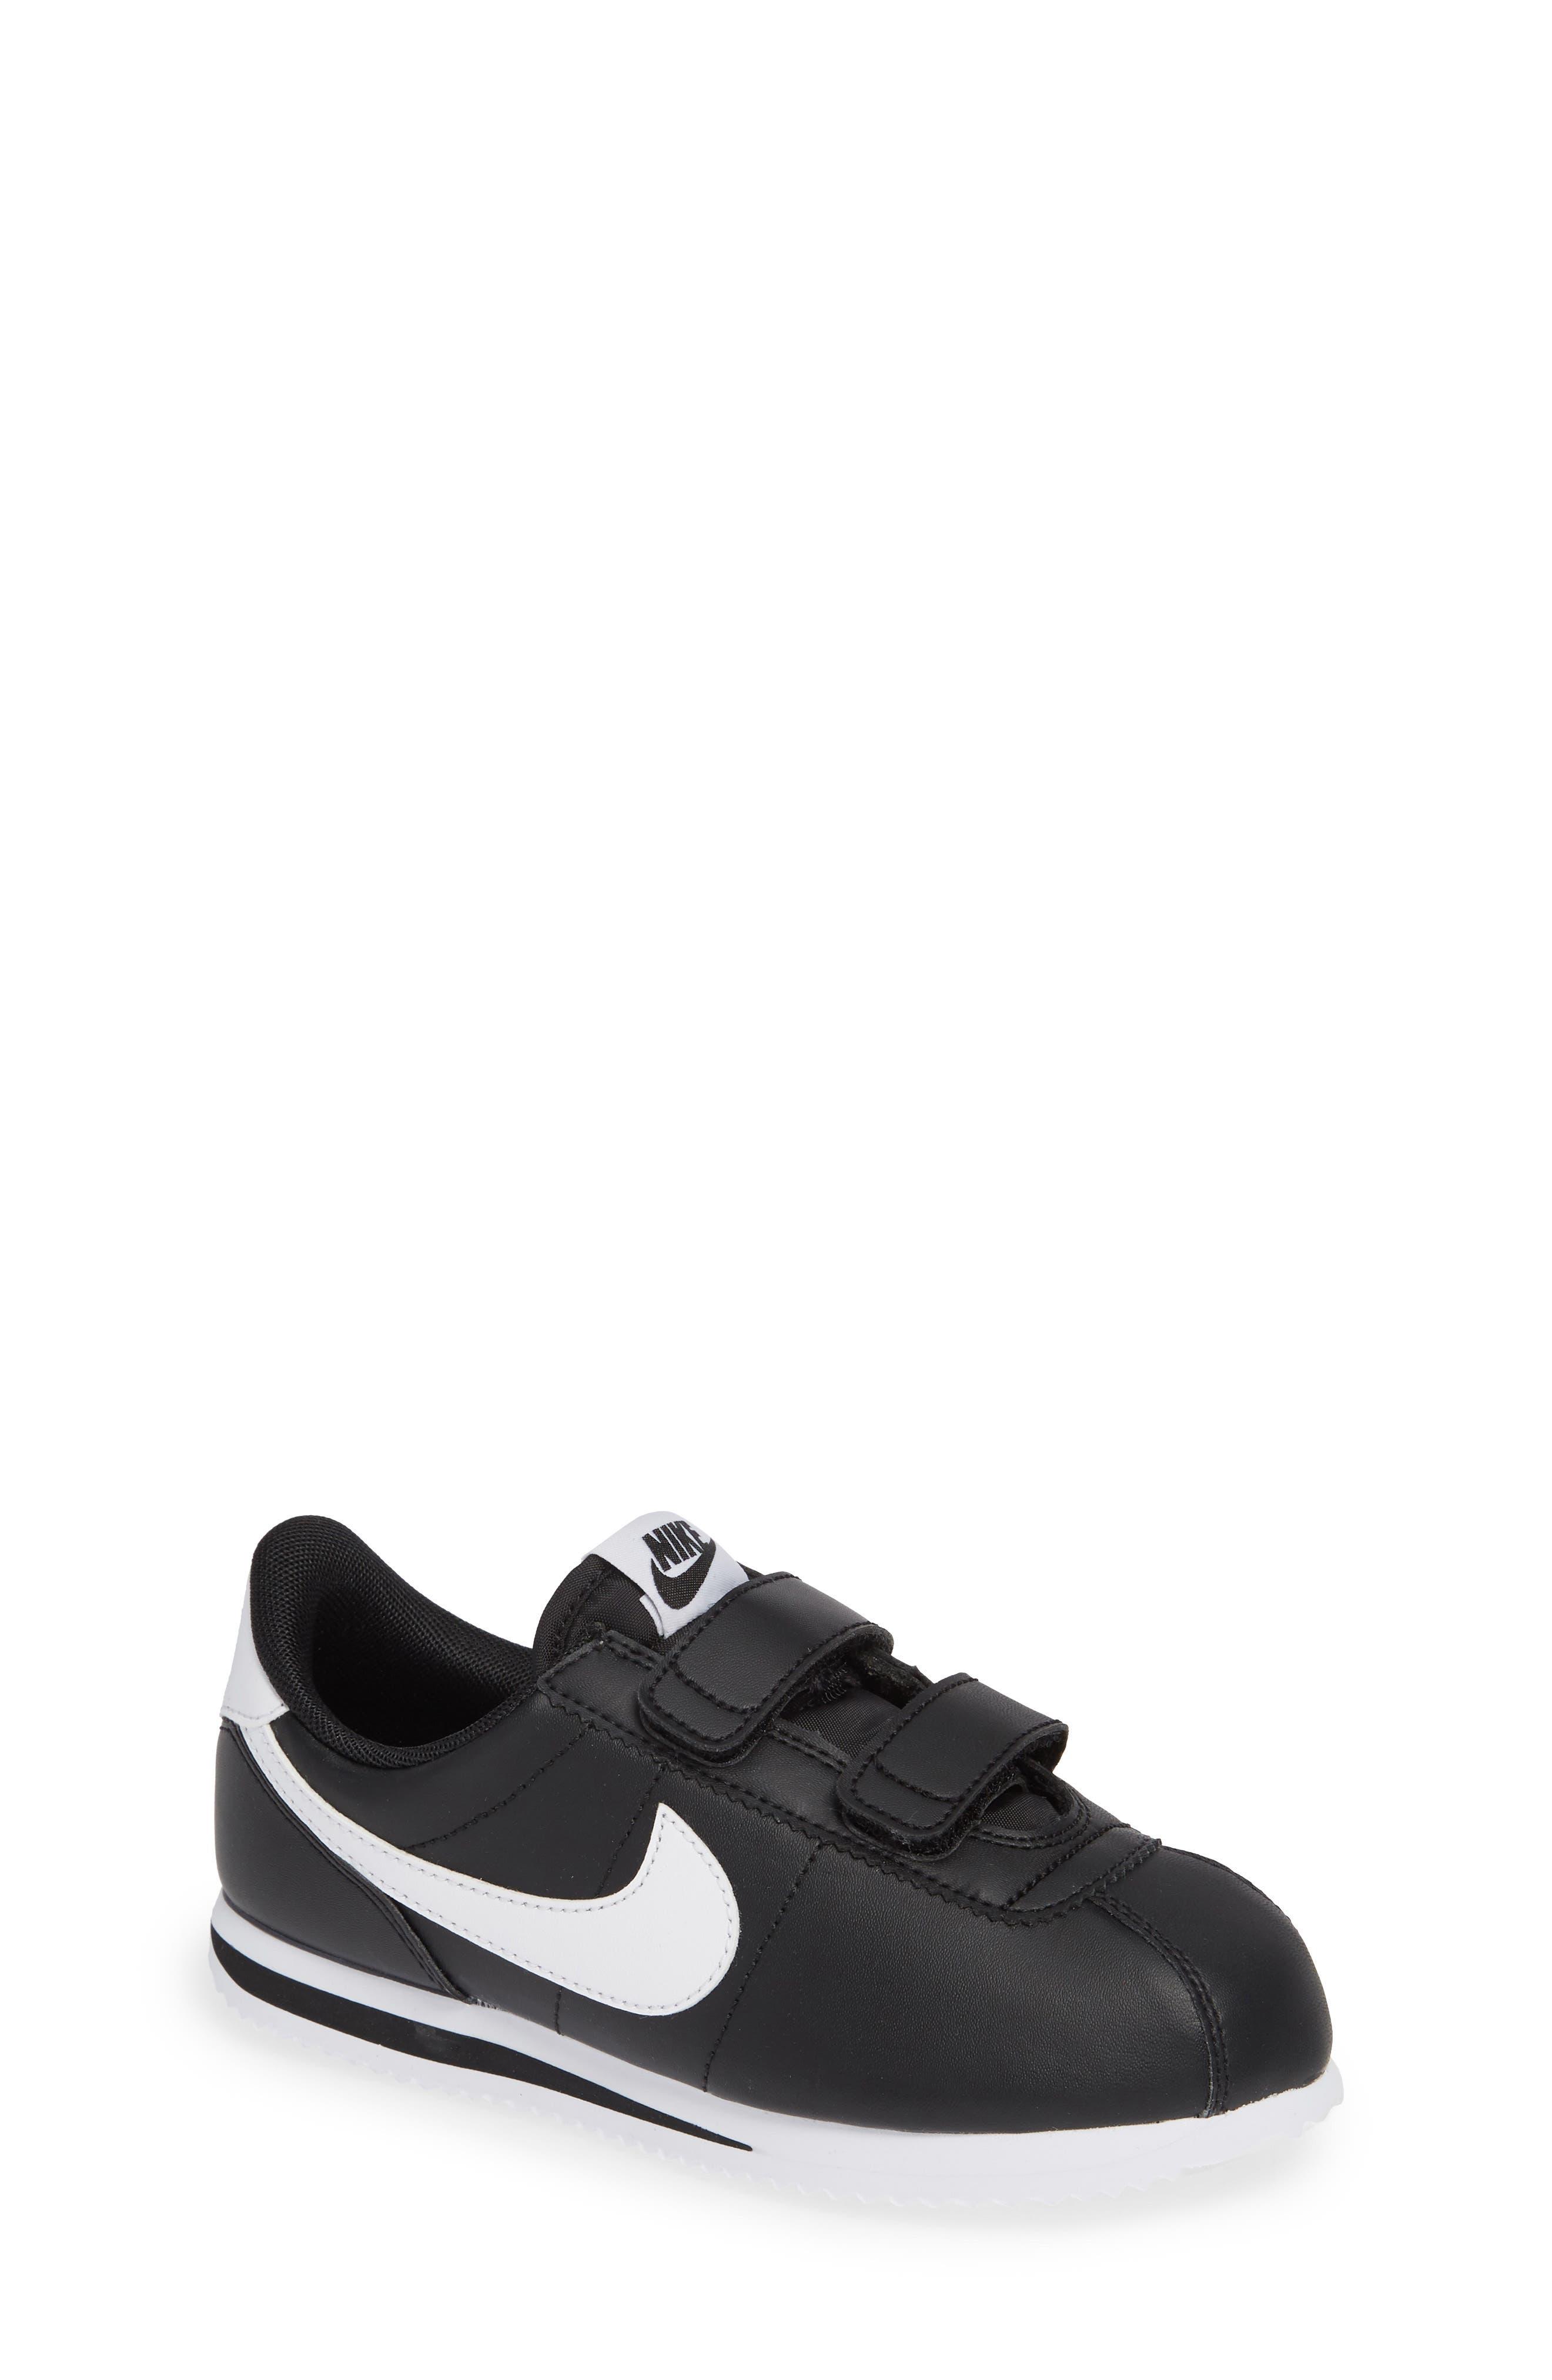 95a315de9313 Nike Baby Shoes